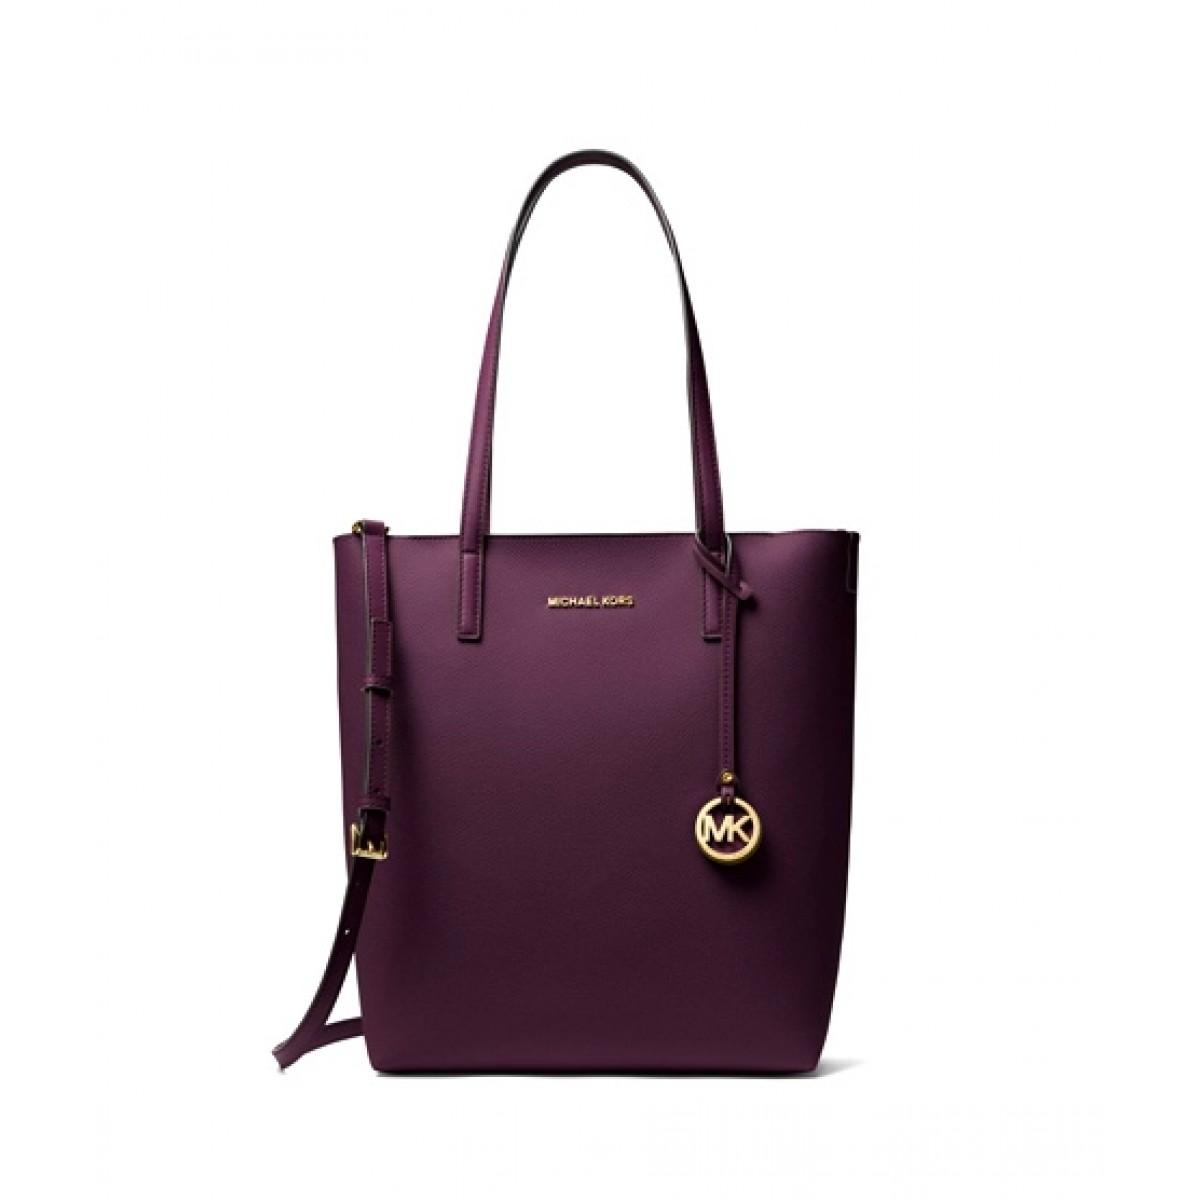 Michael Kors Hayley Large North South Top-Zip Tote Shoulder Bag Purple